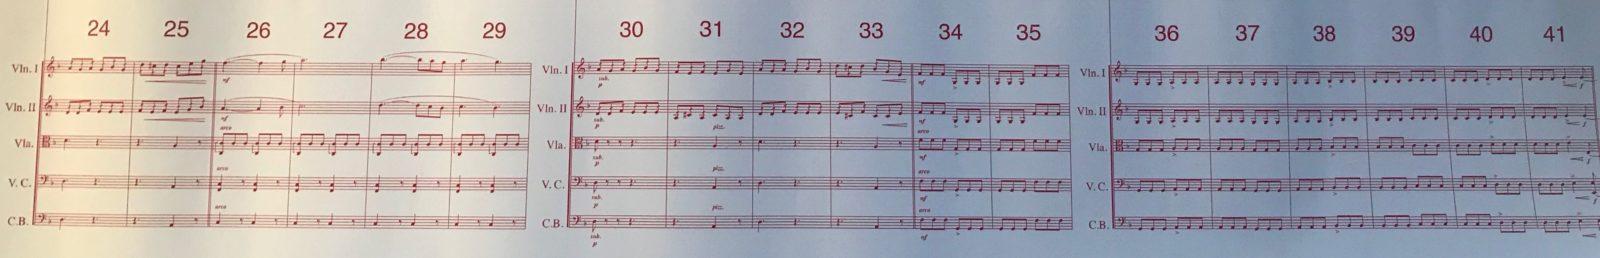 Huawei Cadogan Hall Londres Schubert 8è symphonie partition